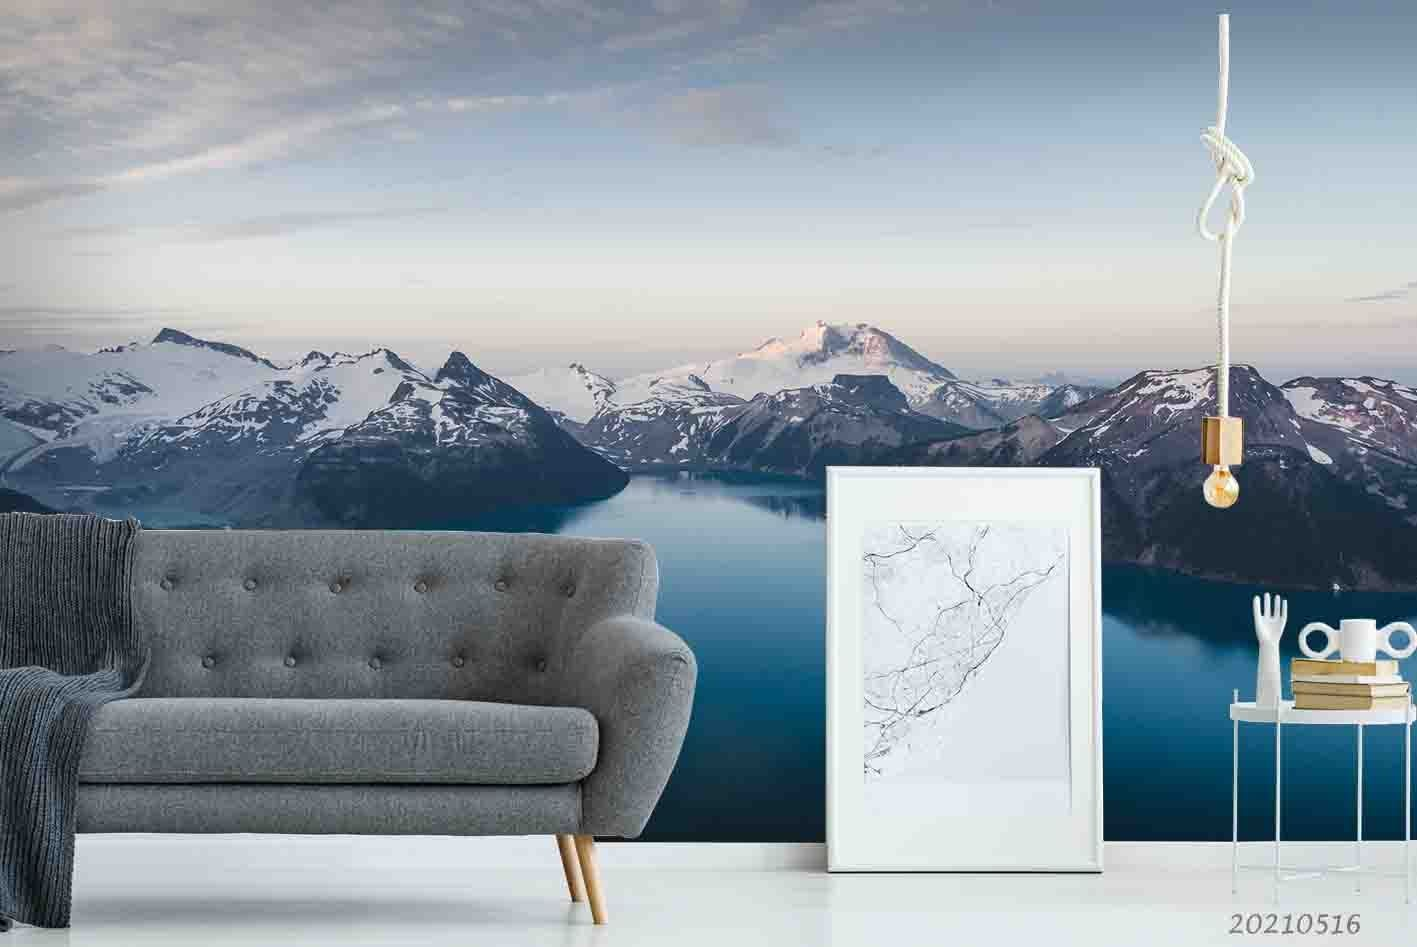 3D Landscape Snow Mountain Lake Wall Mural Wallpaper LQH 31